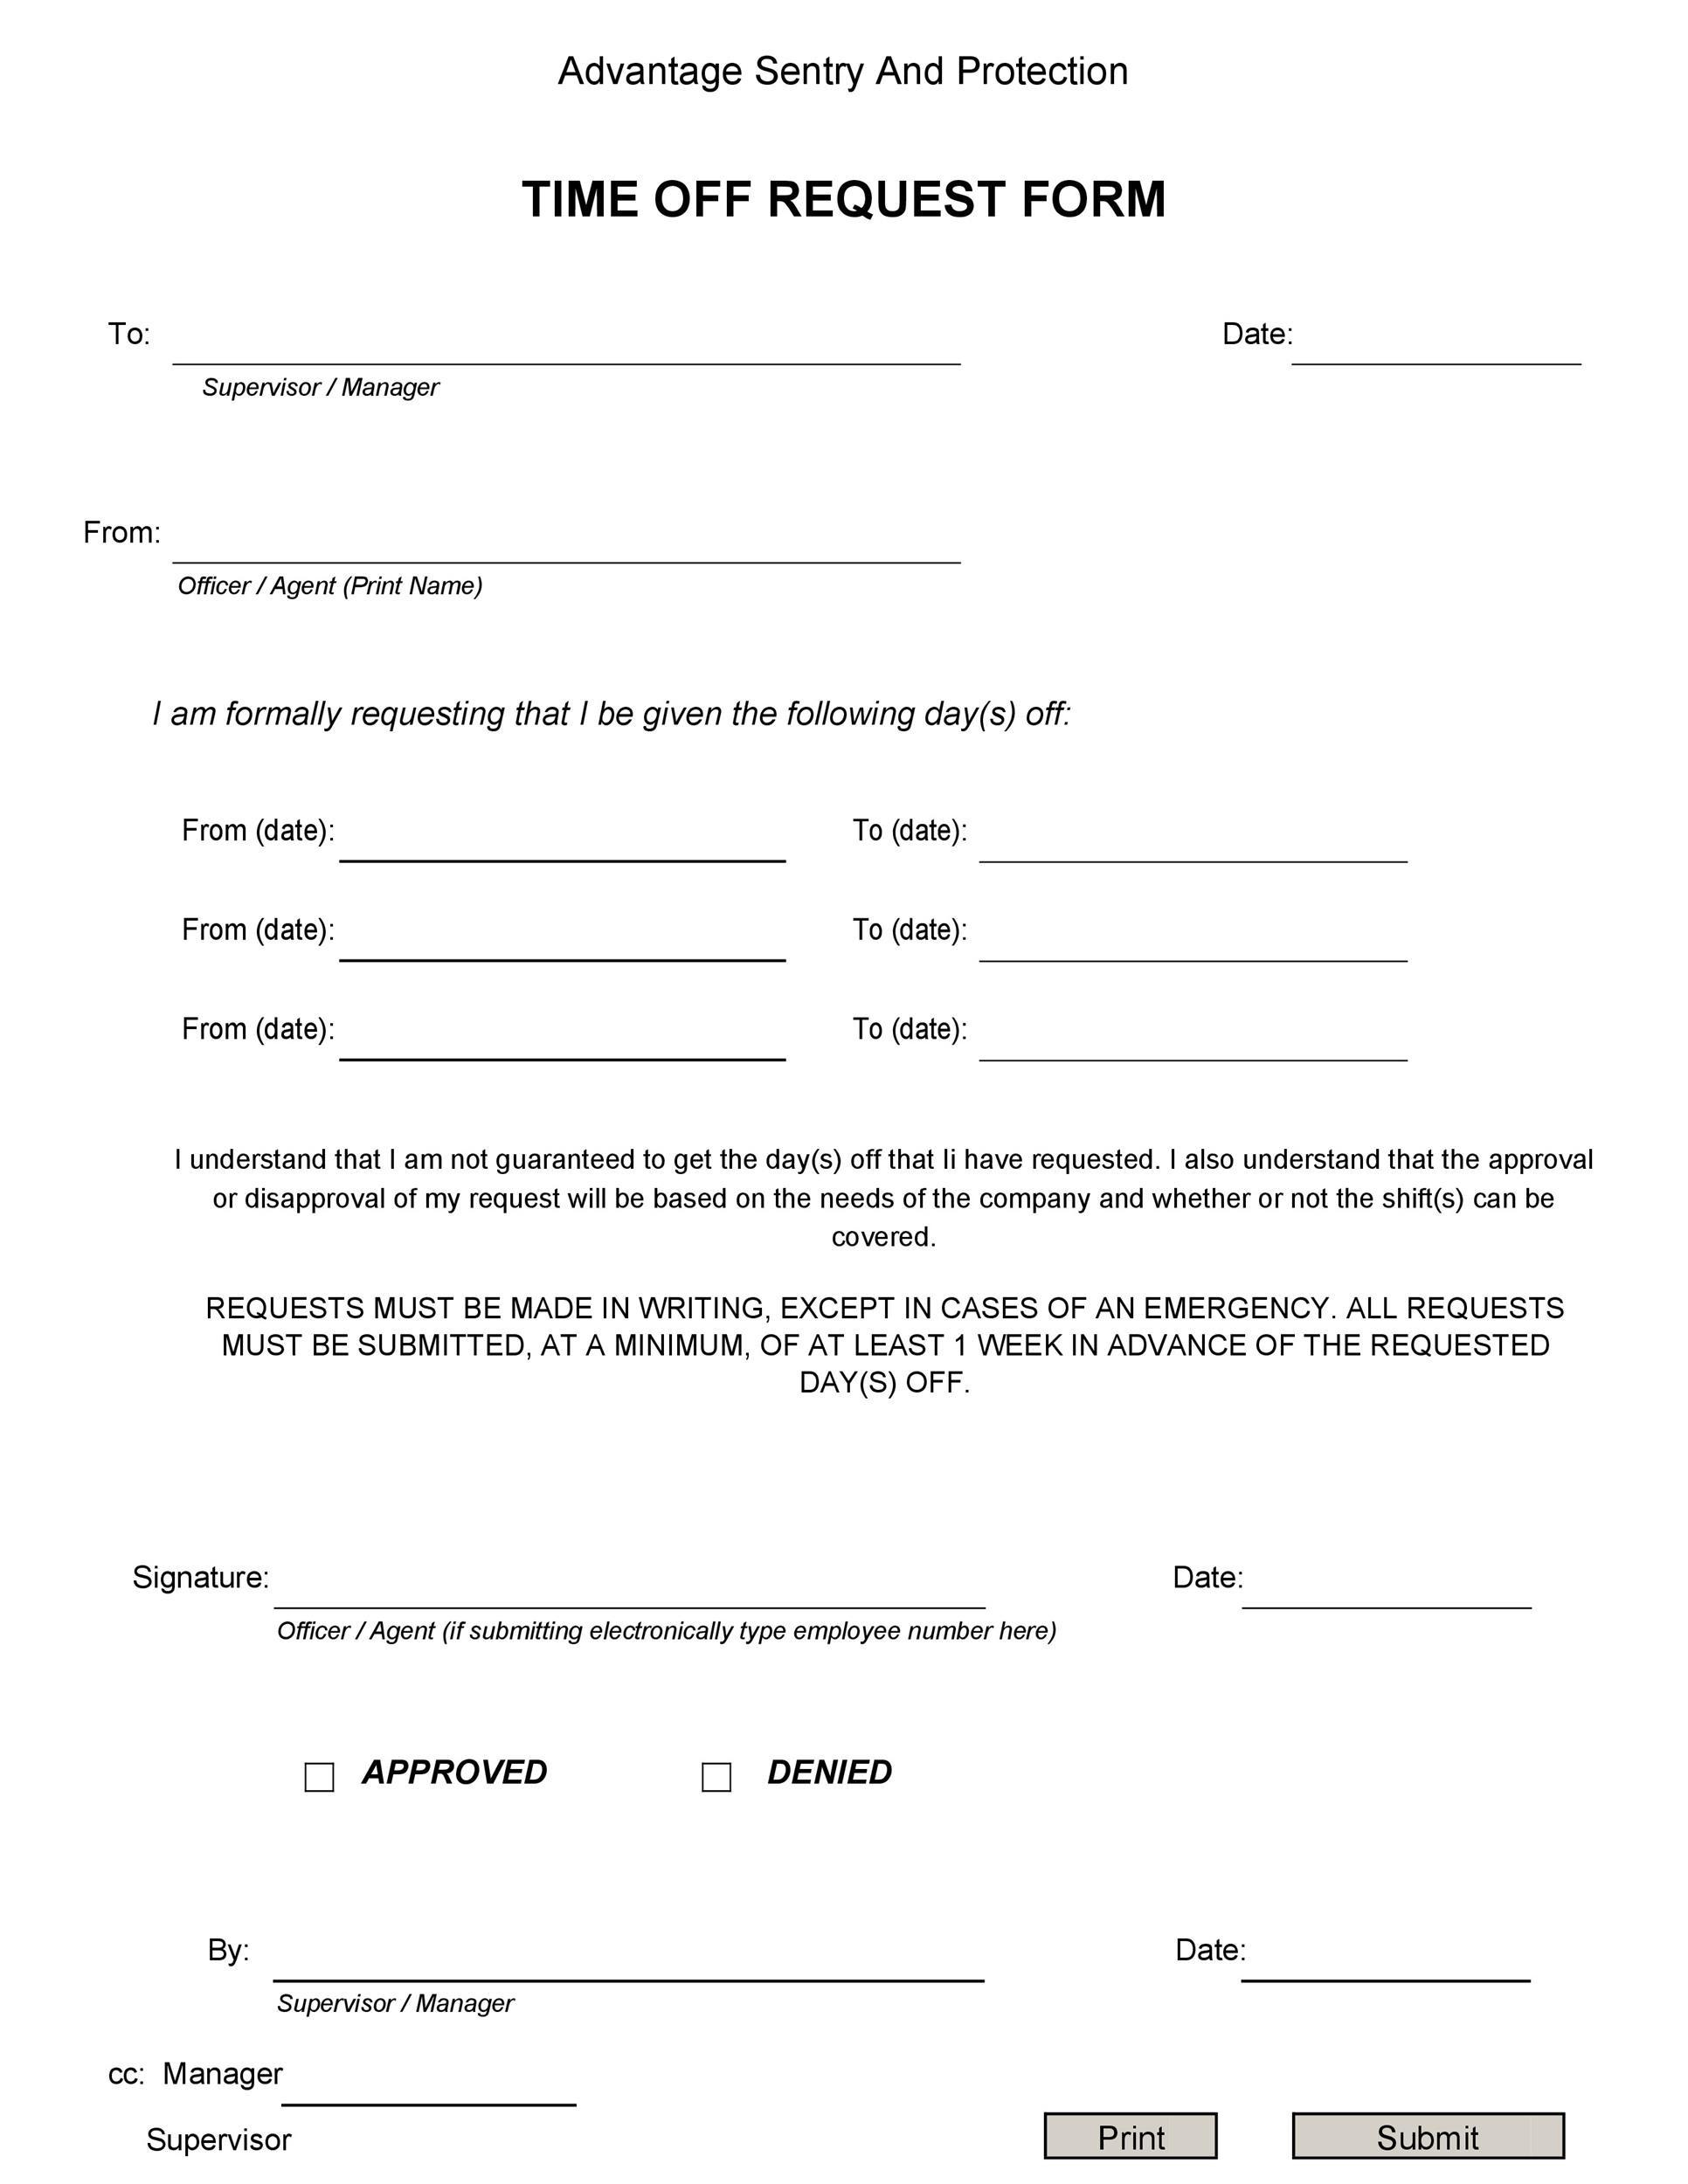 time off request form template 15 template lab. Black Bedroom Furniture Sets. Home Design Ideas